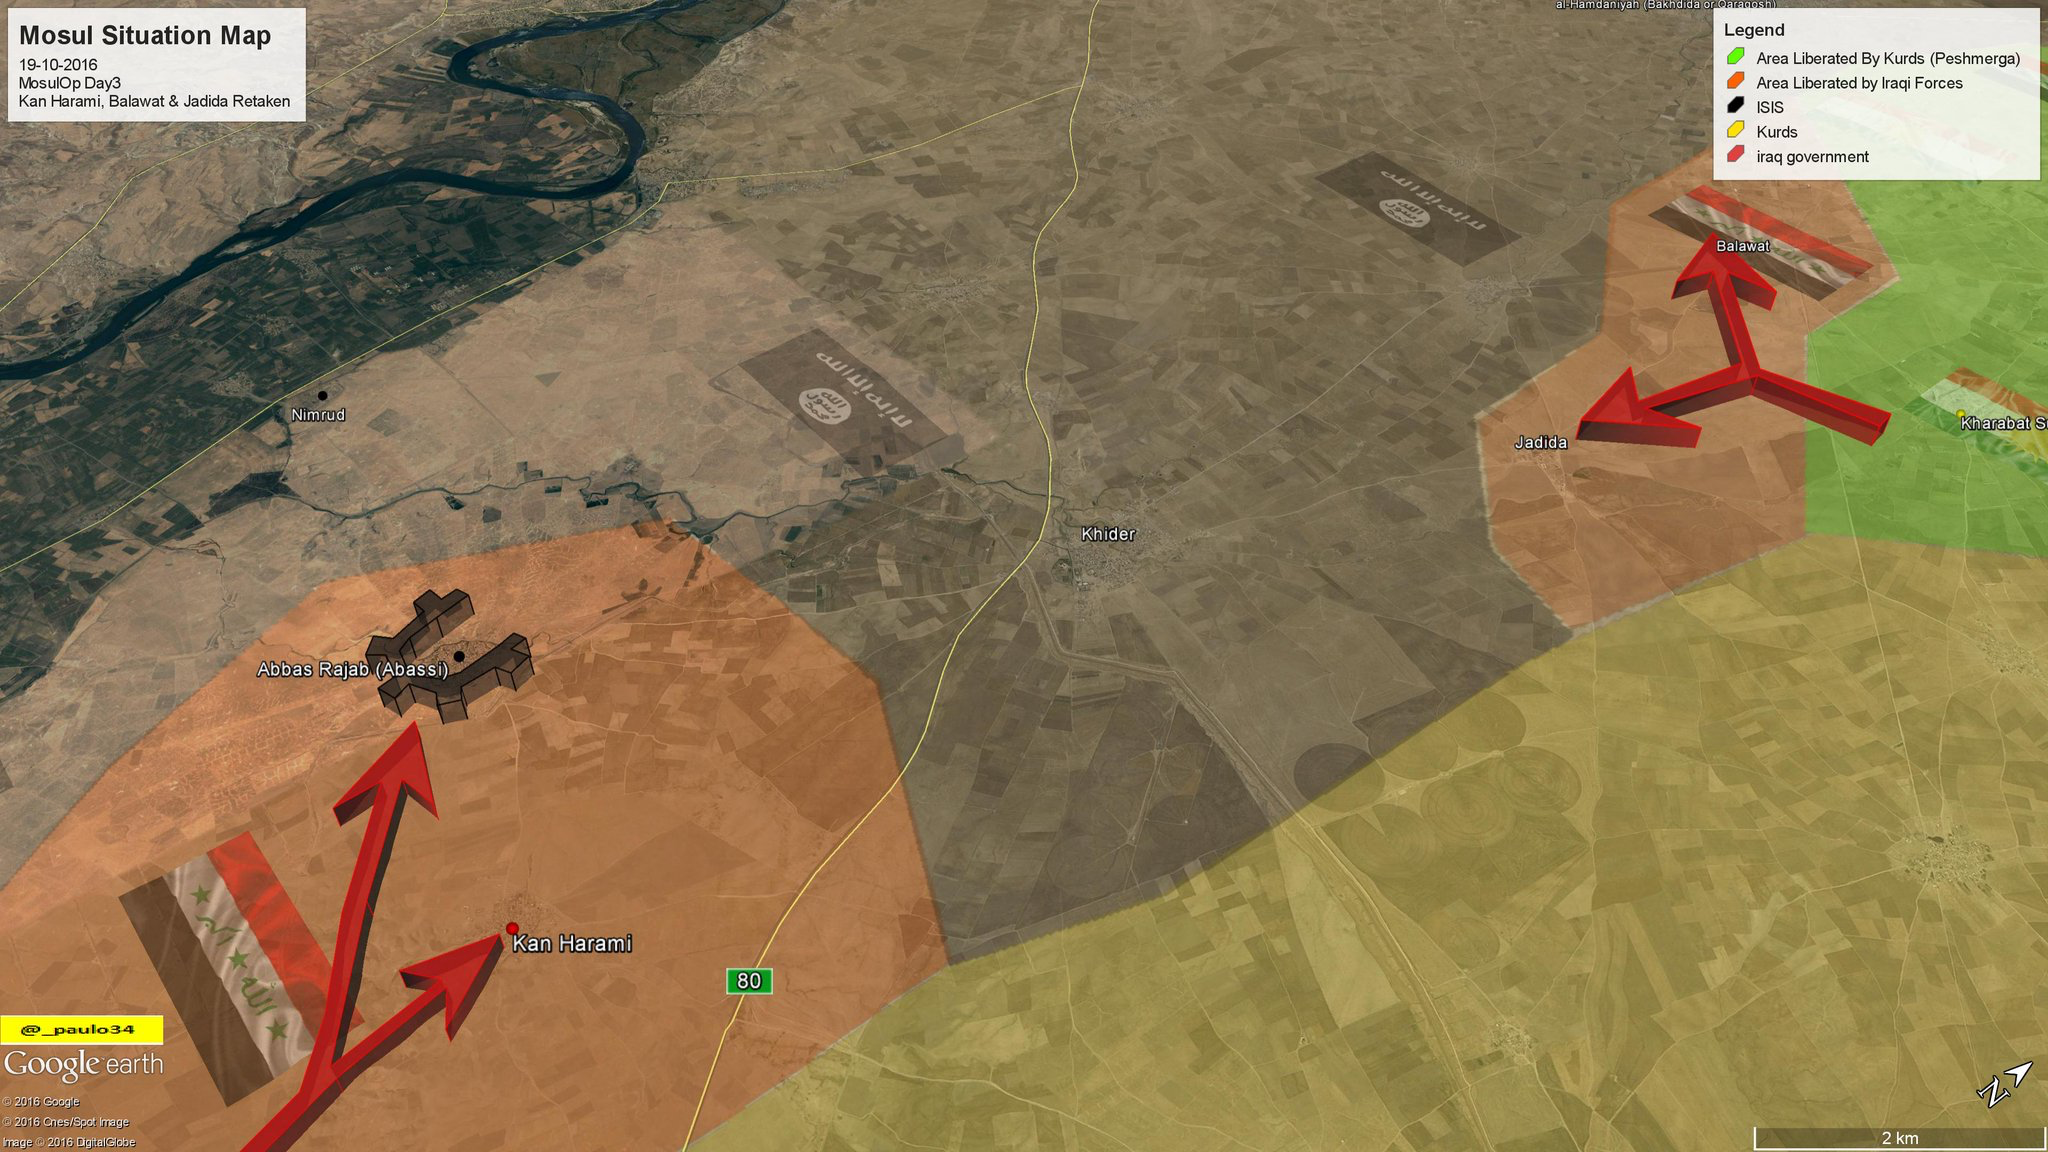 Mosul Situation Map Day3 19 10 2016 Iraq Peshmerga